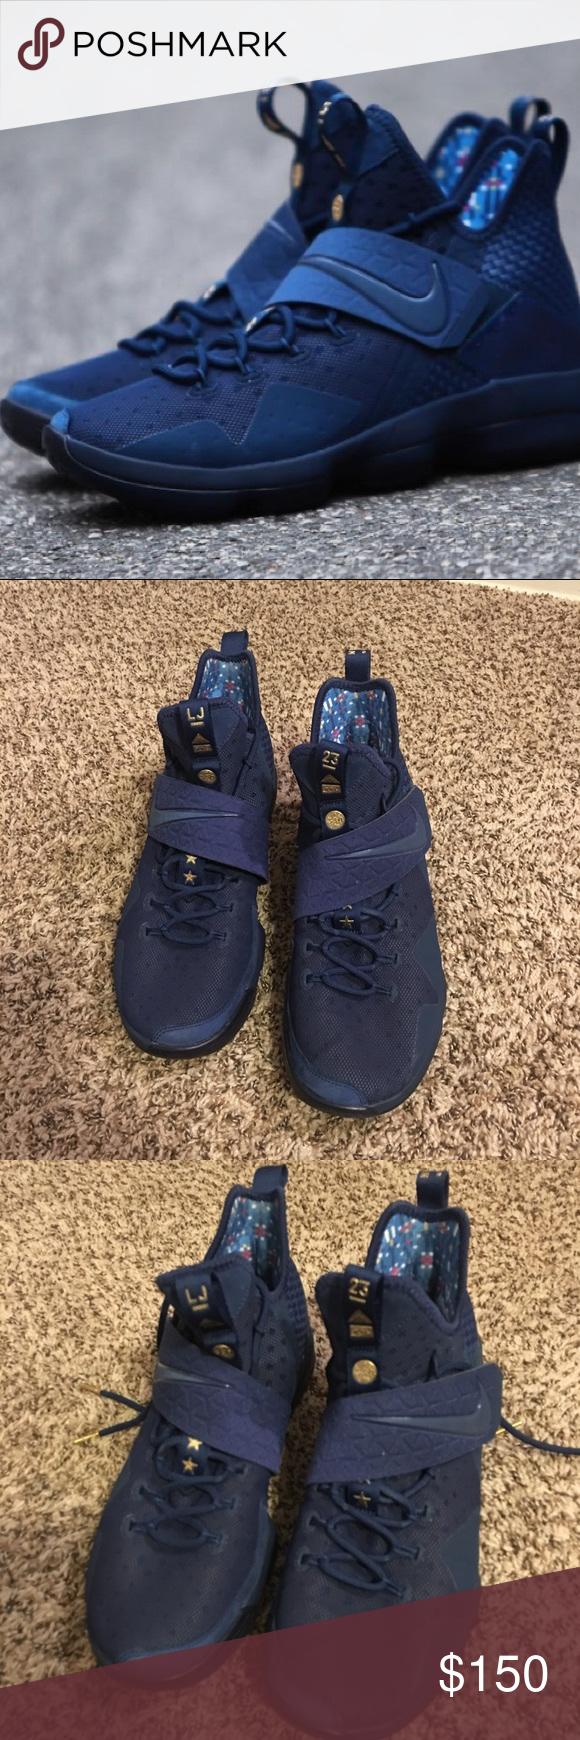 "brand new 17b8b 391ec LBJ XIV basketball shoes Barely worn. ""Agimat"" style LeBron ..."